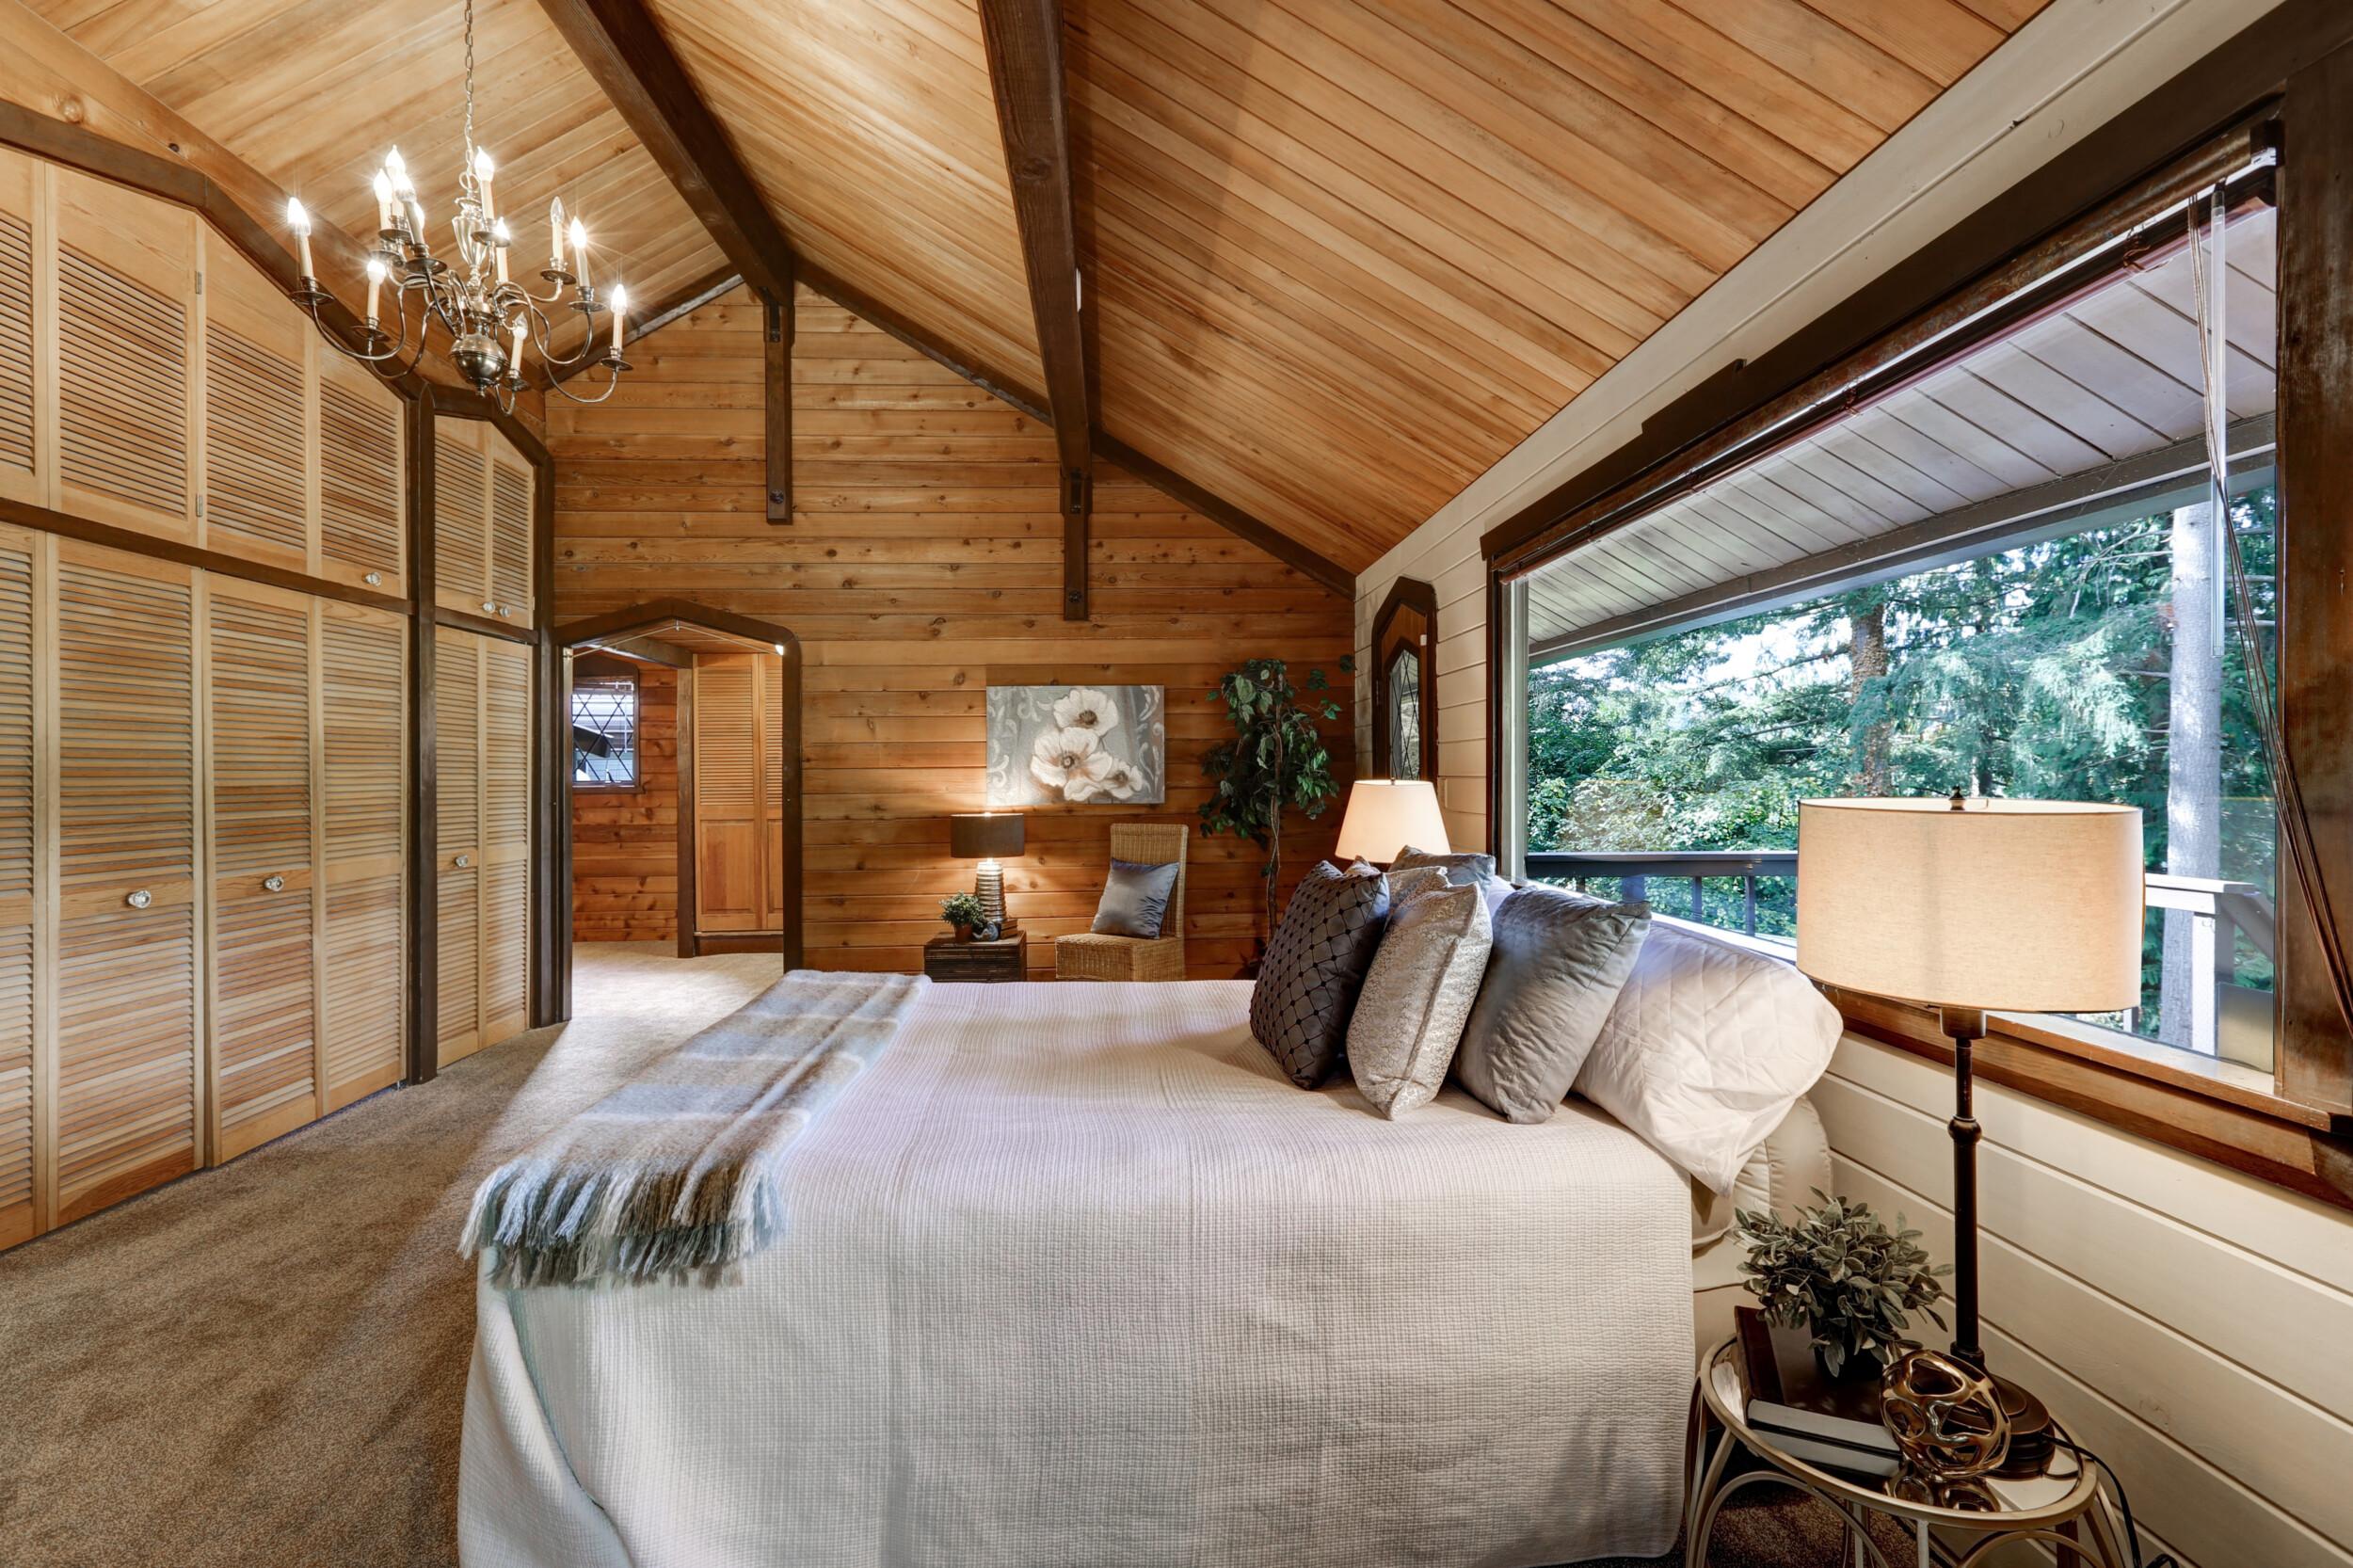 bedroom vaulted ceiling wooden panels